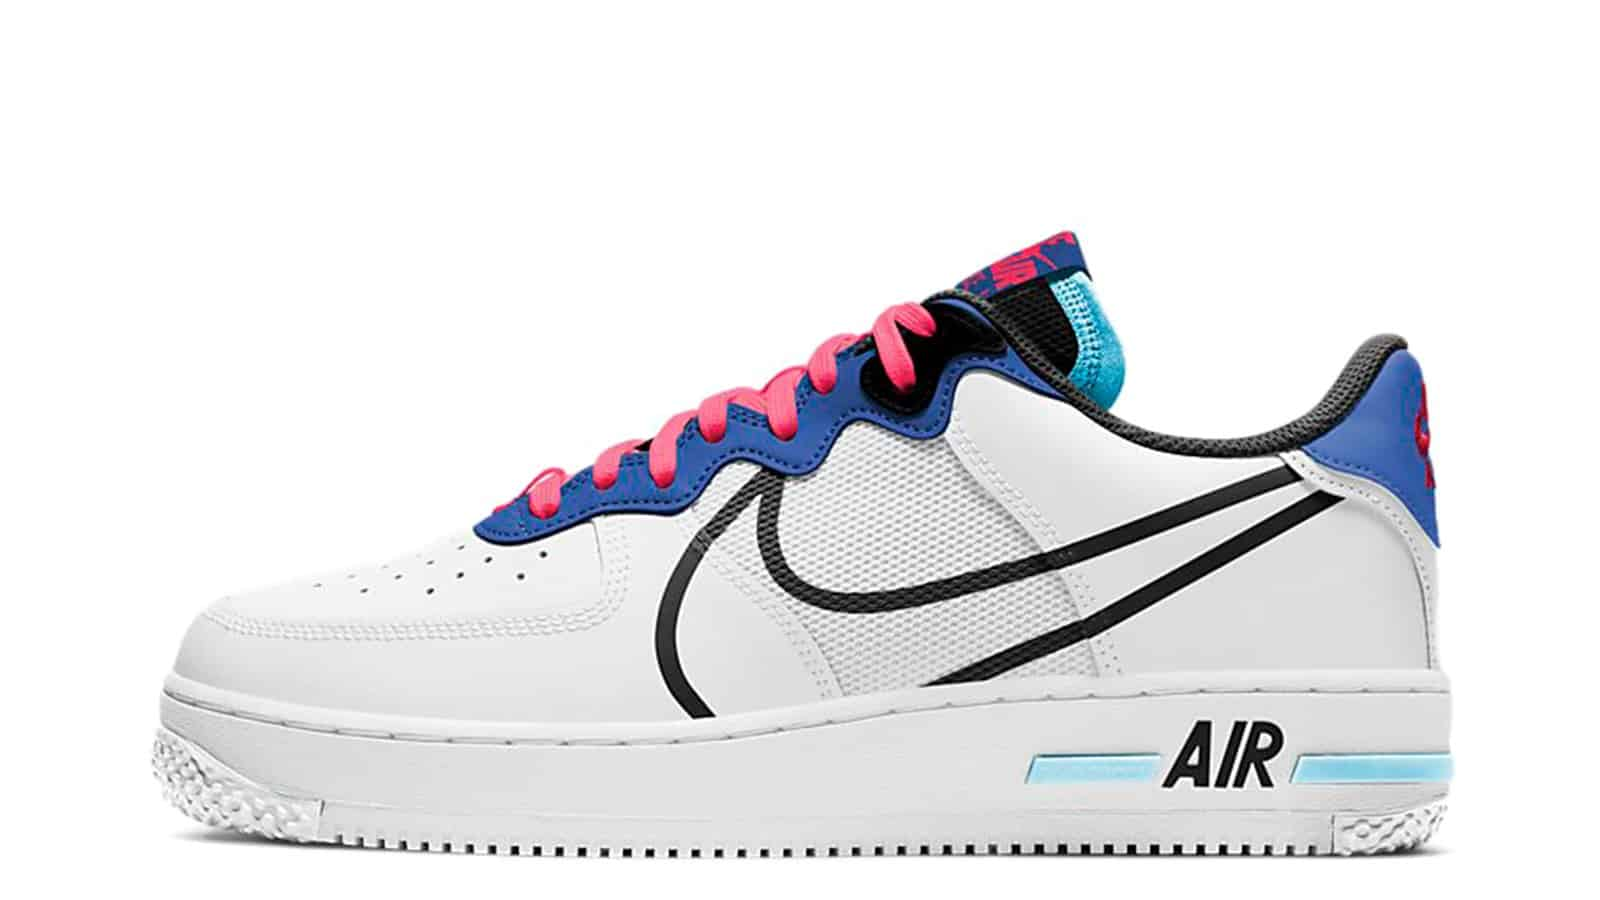 Nike Air Force 1 React CT1020-102